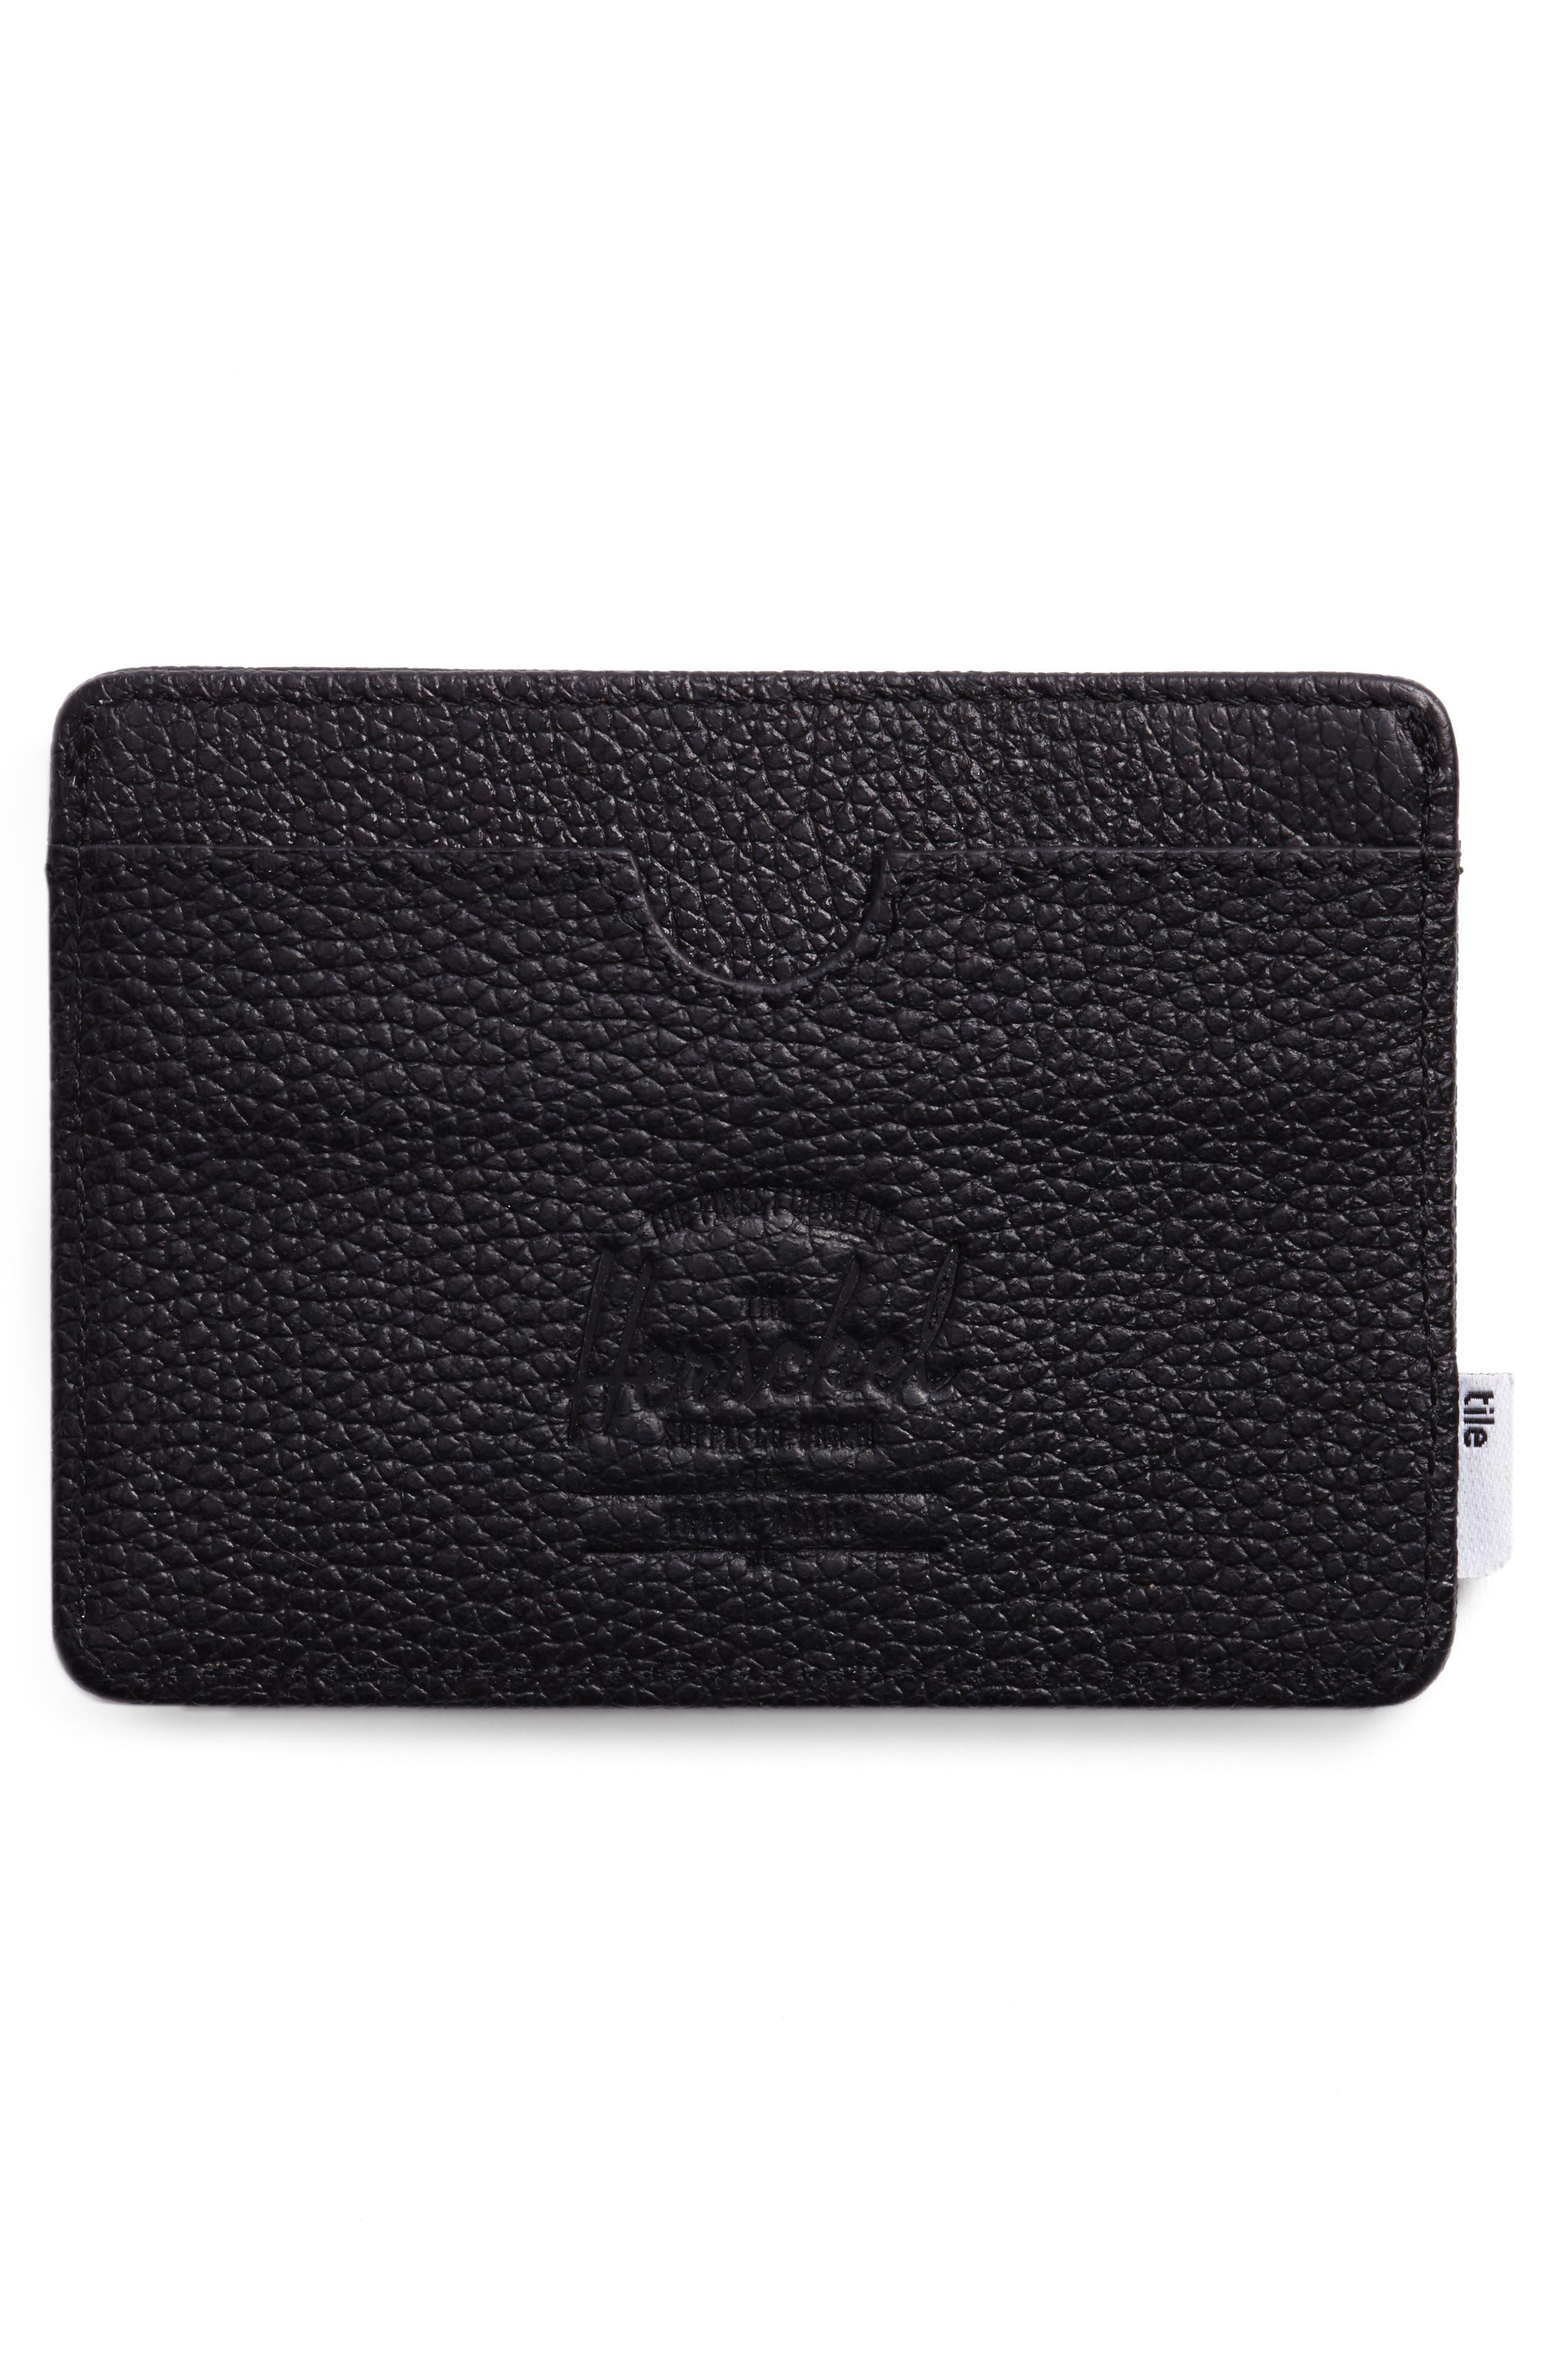 Tile Slim Charlie Leather Card Case,                             Alternate thumbnail 3, color,                             BLACK PEBBLED LEATHER